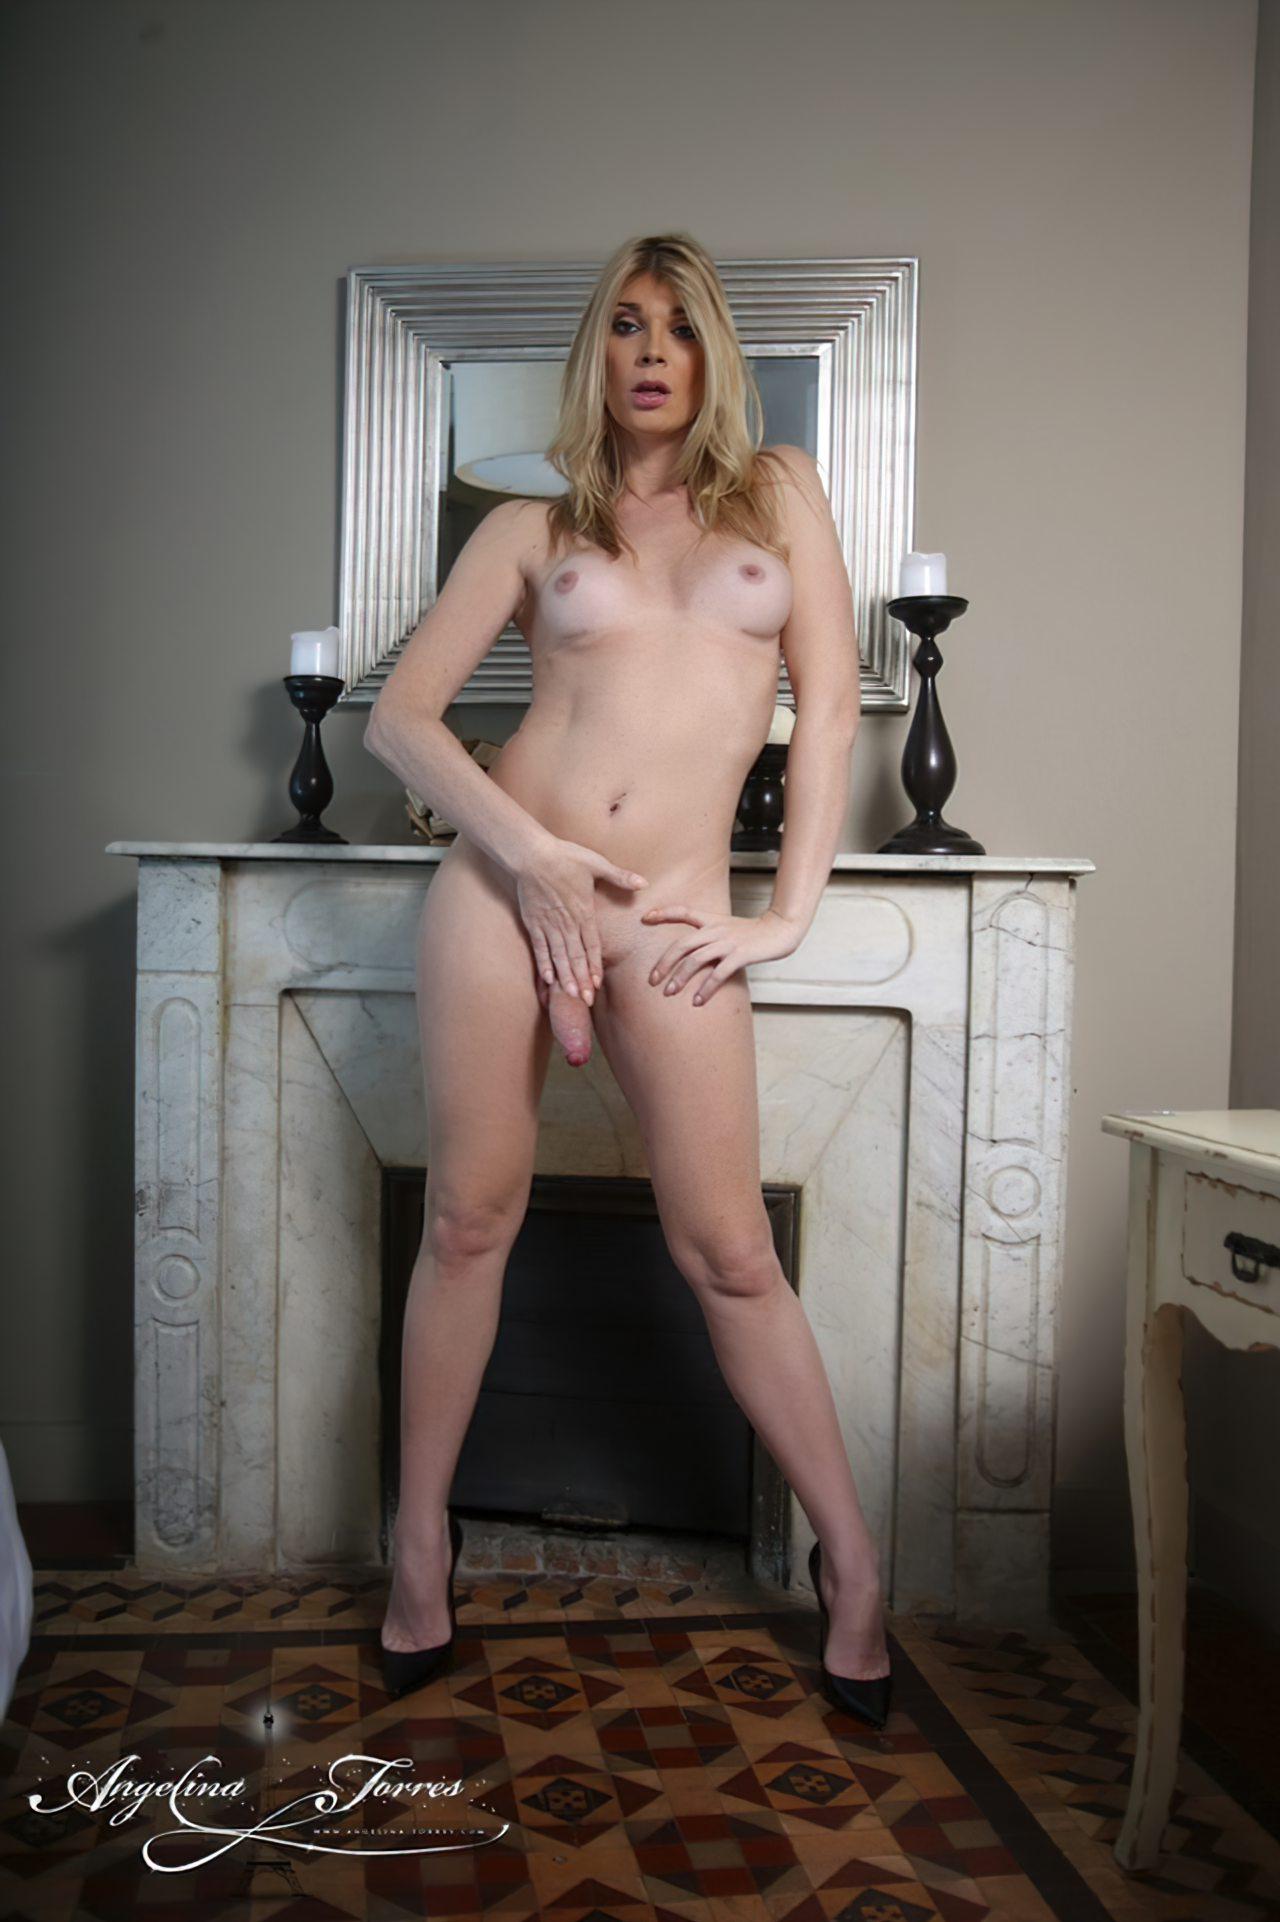 Angelina Torres Travesti (11)